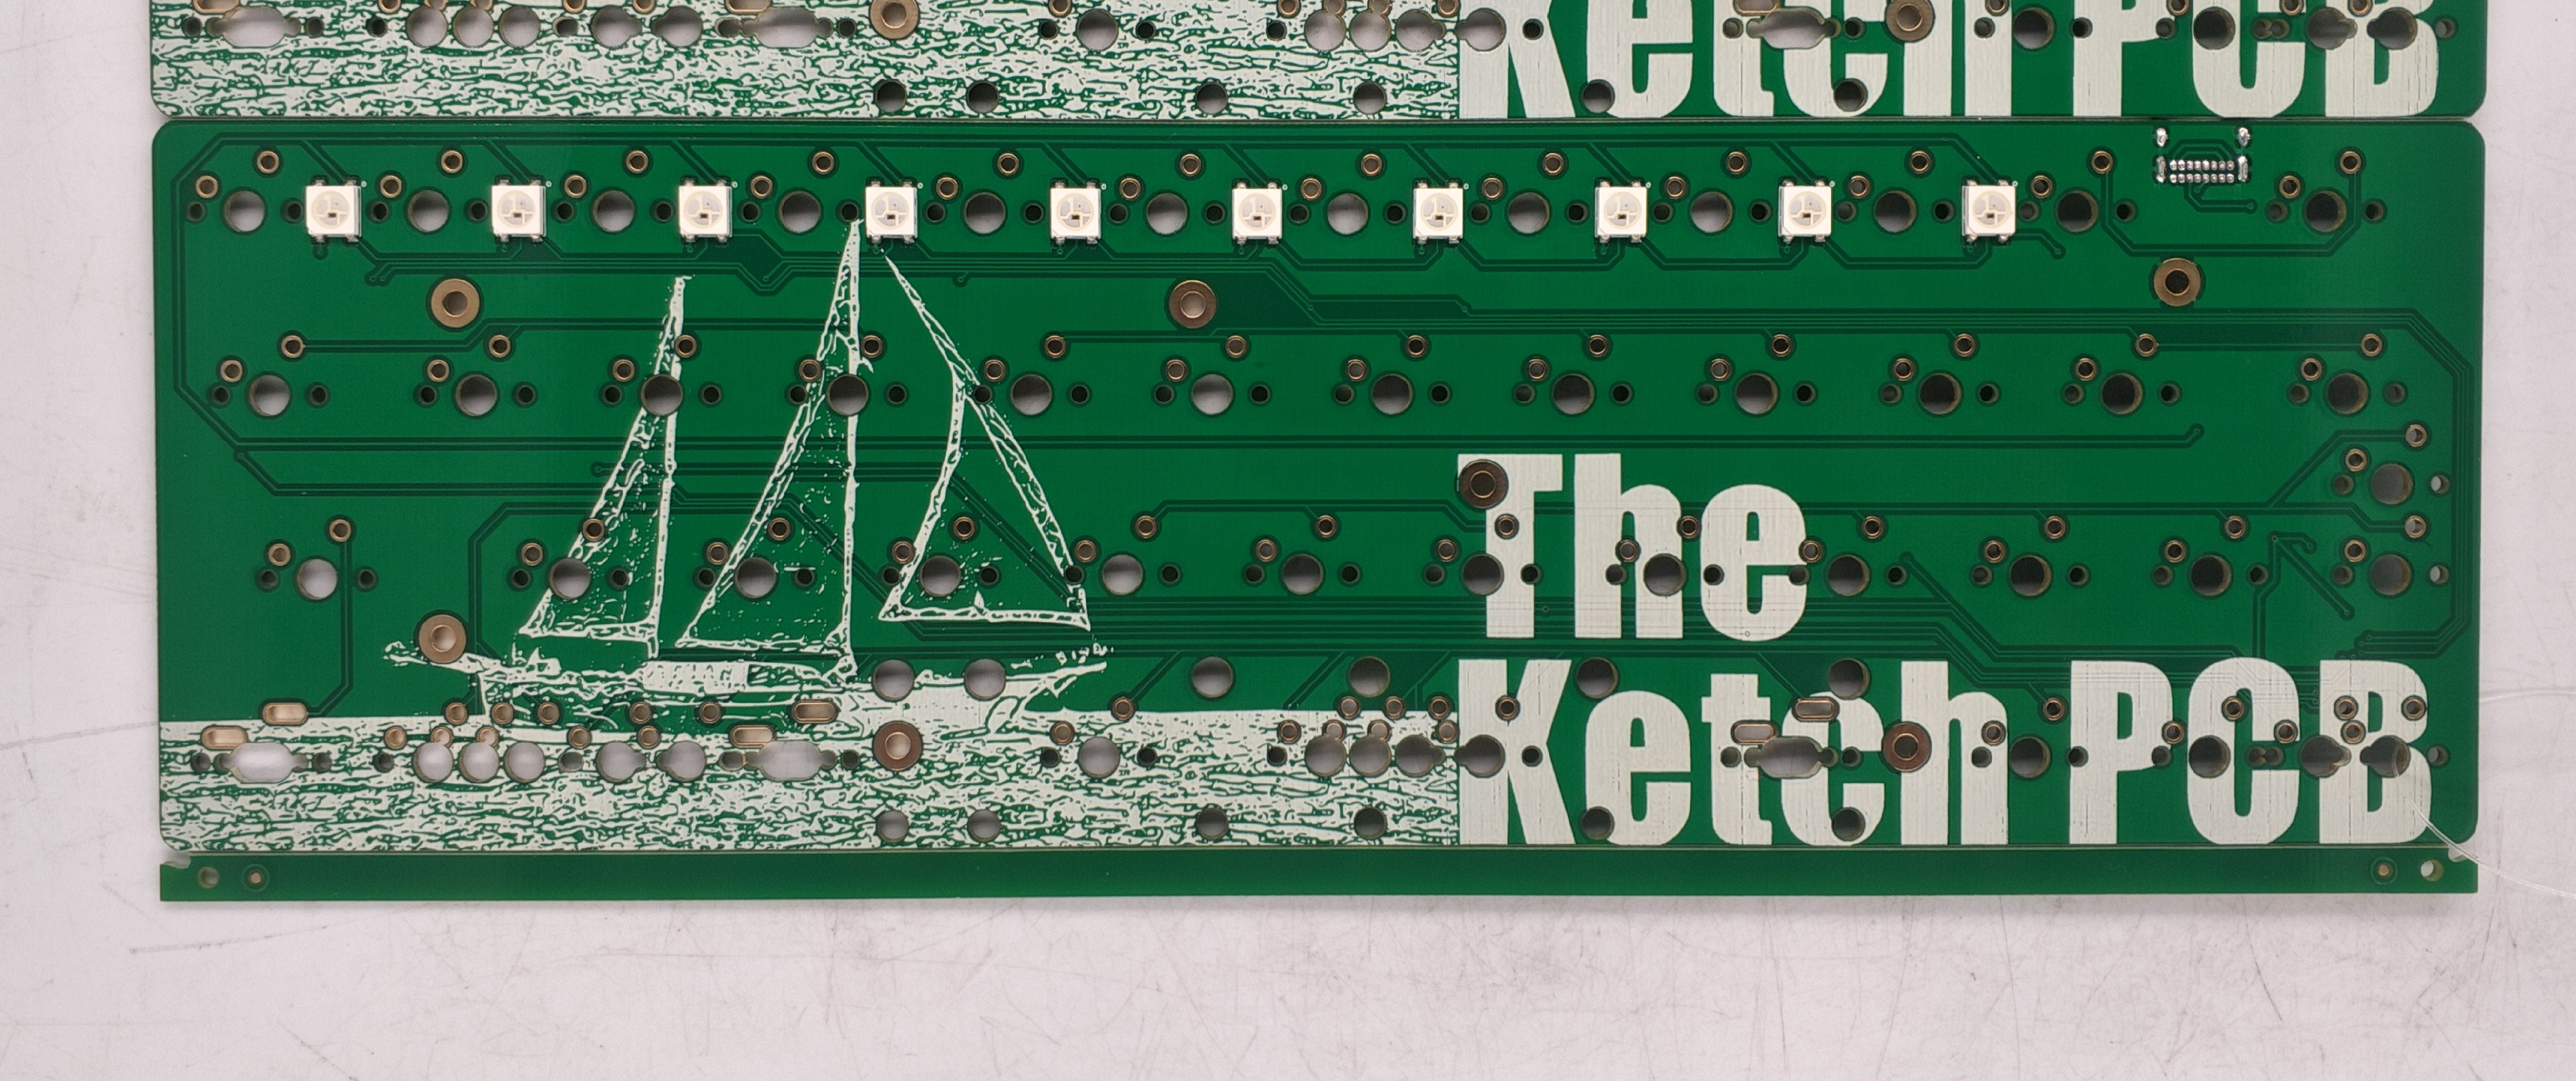 Ketch rev 1.1 front